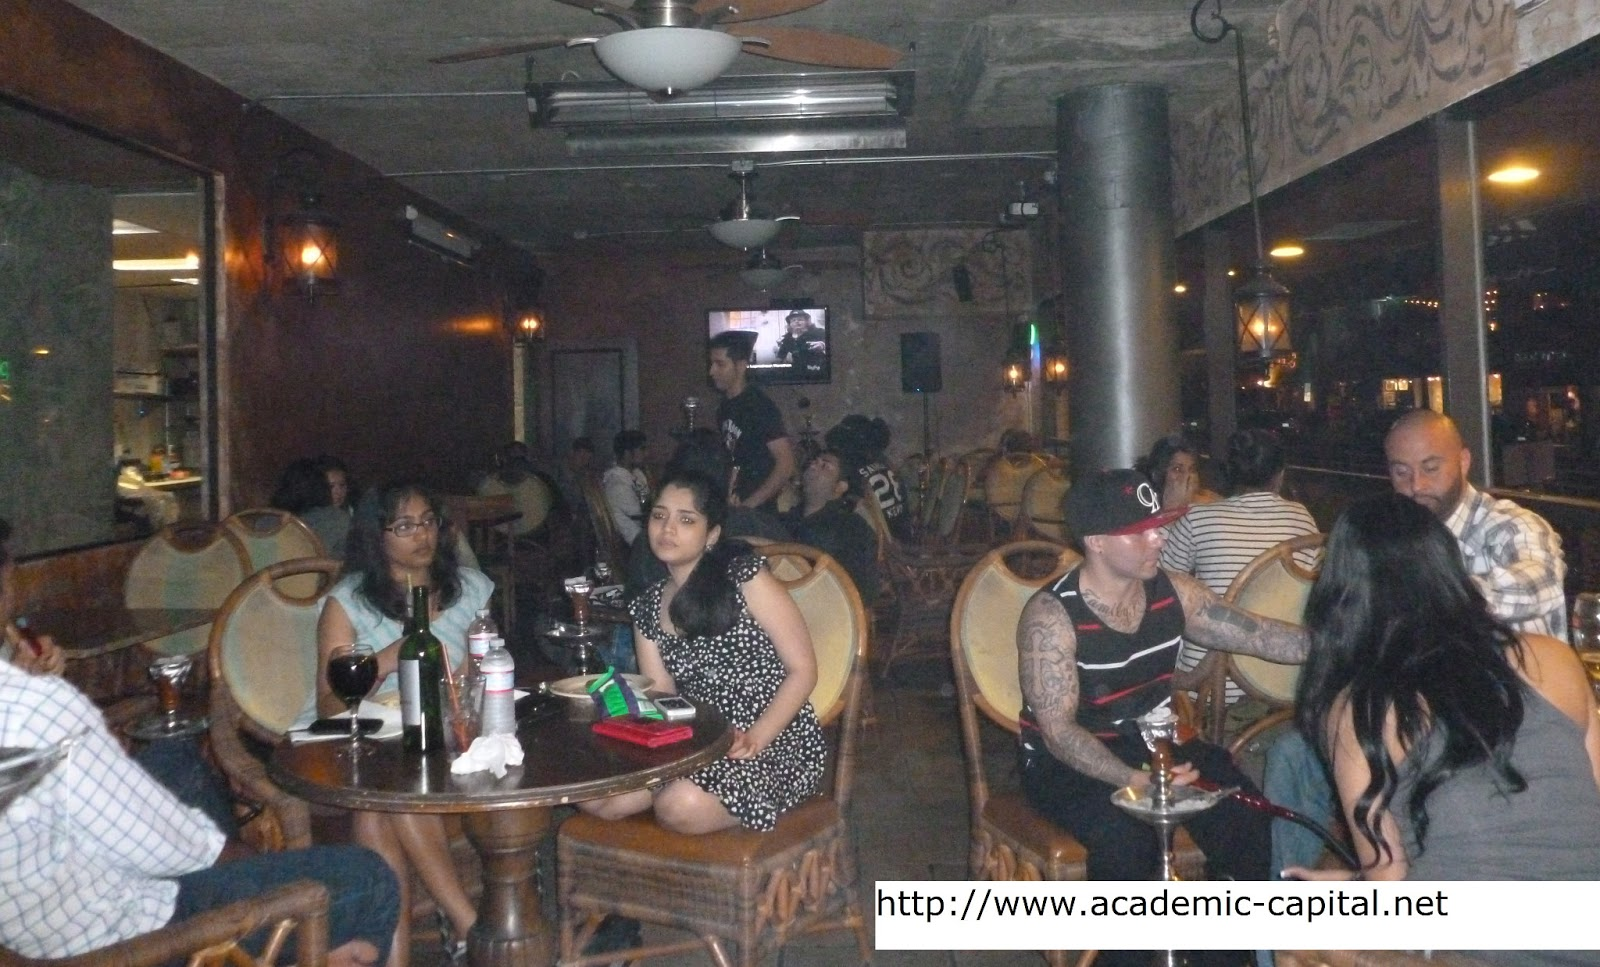 Academic Capital La Jolla Hookah Lounge Review Just Look Up